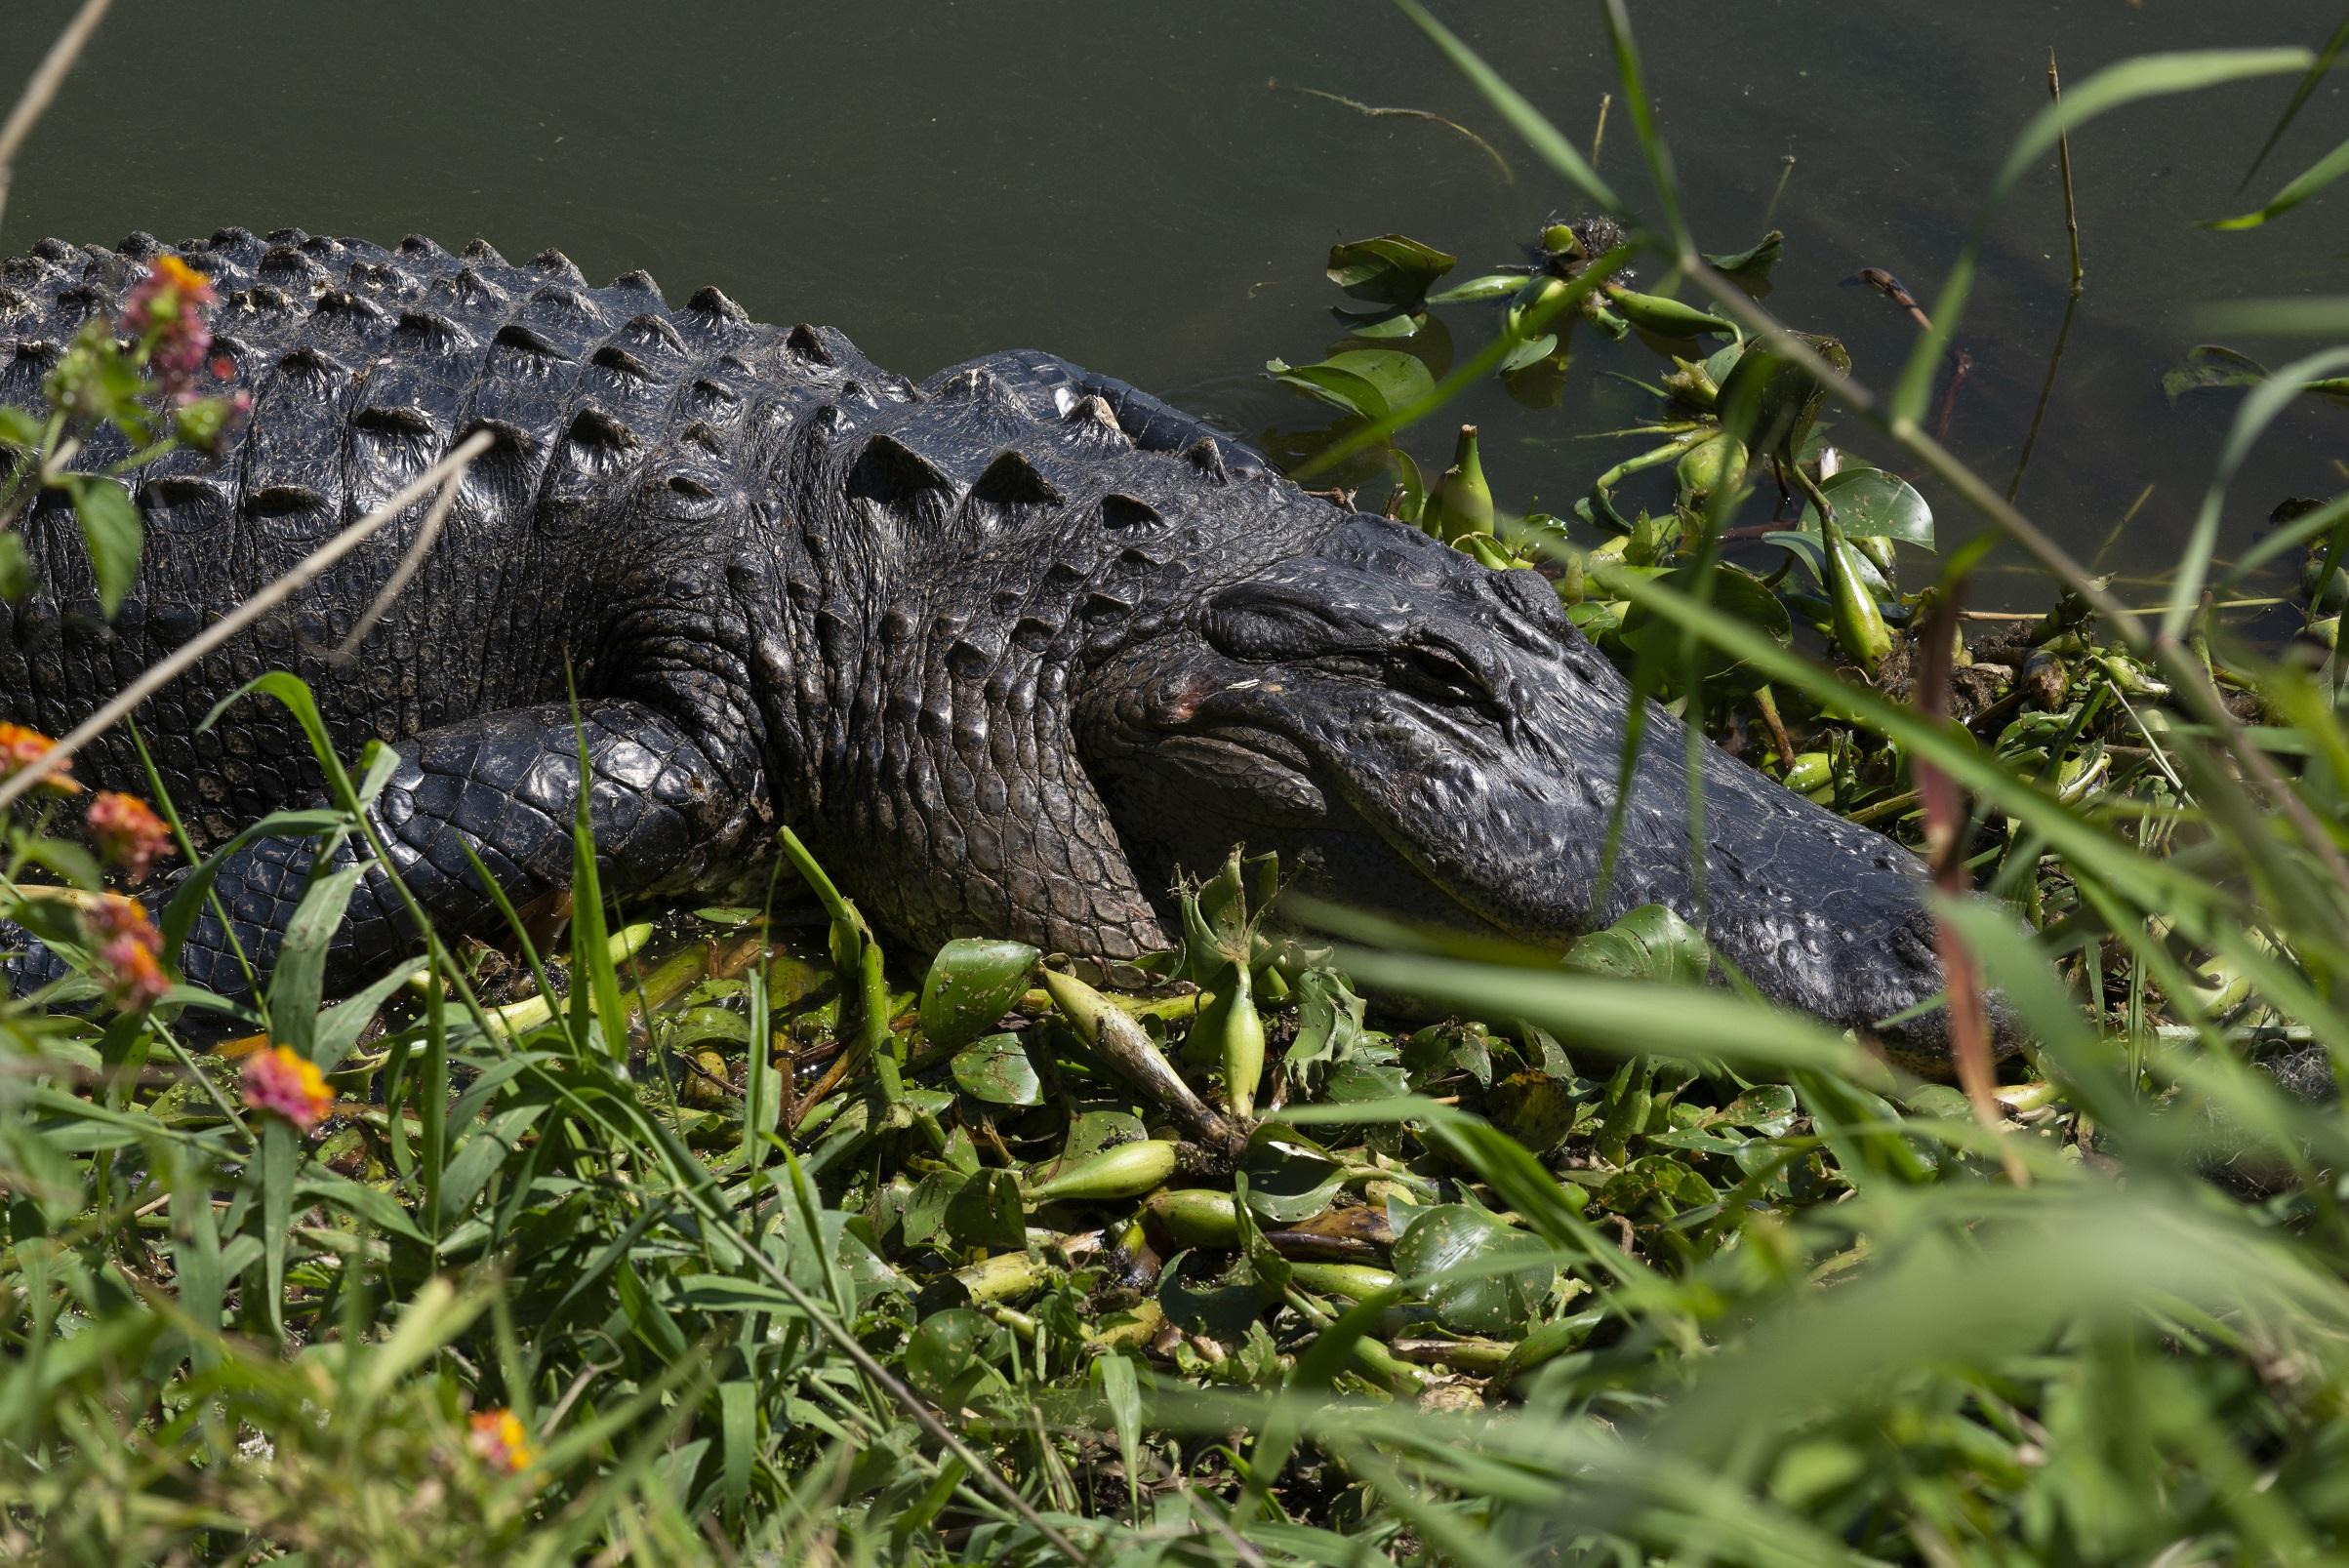 Alligator at Circle B Bar Reserve